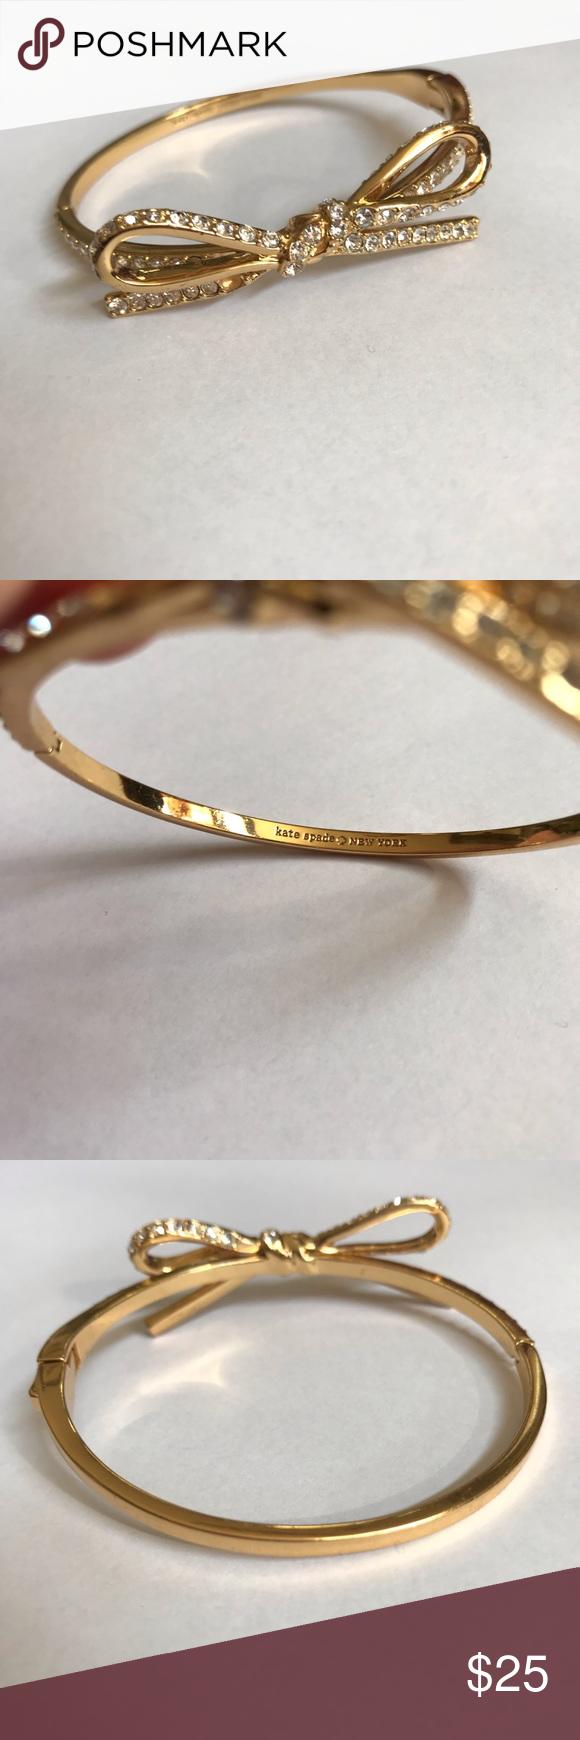 c41e92fcf30eb Kate Spade Sparkly Bow Bracelet NWOT. Brand new. Never worn. Pretty ...